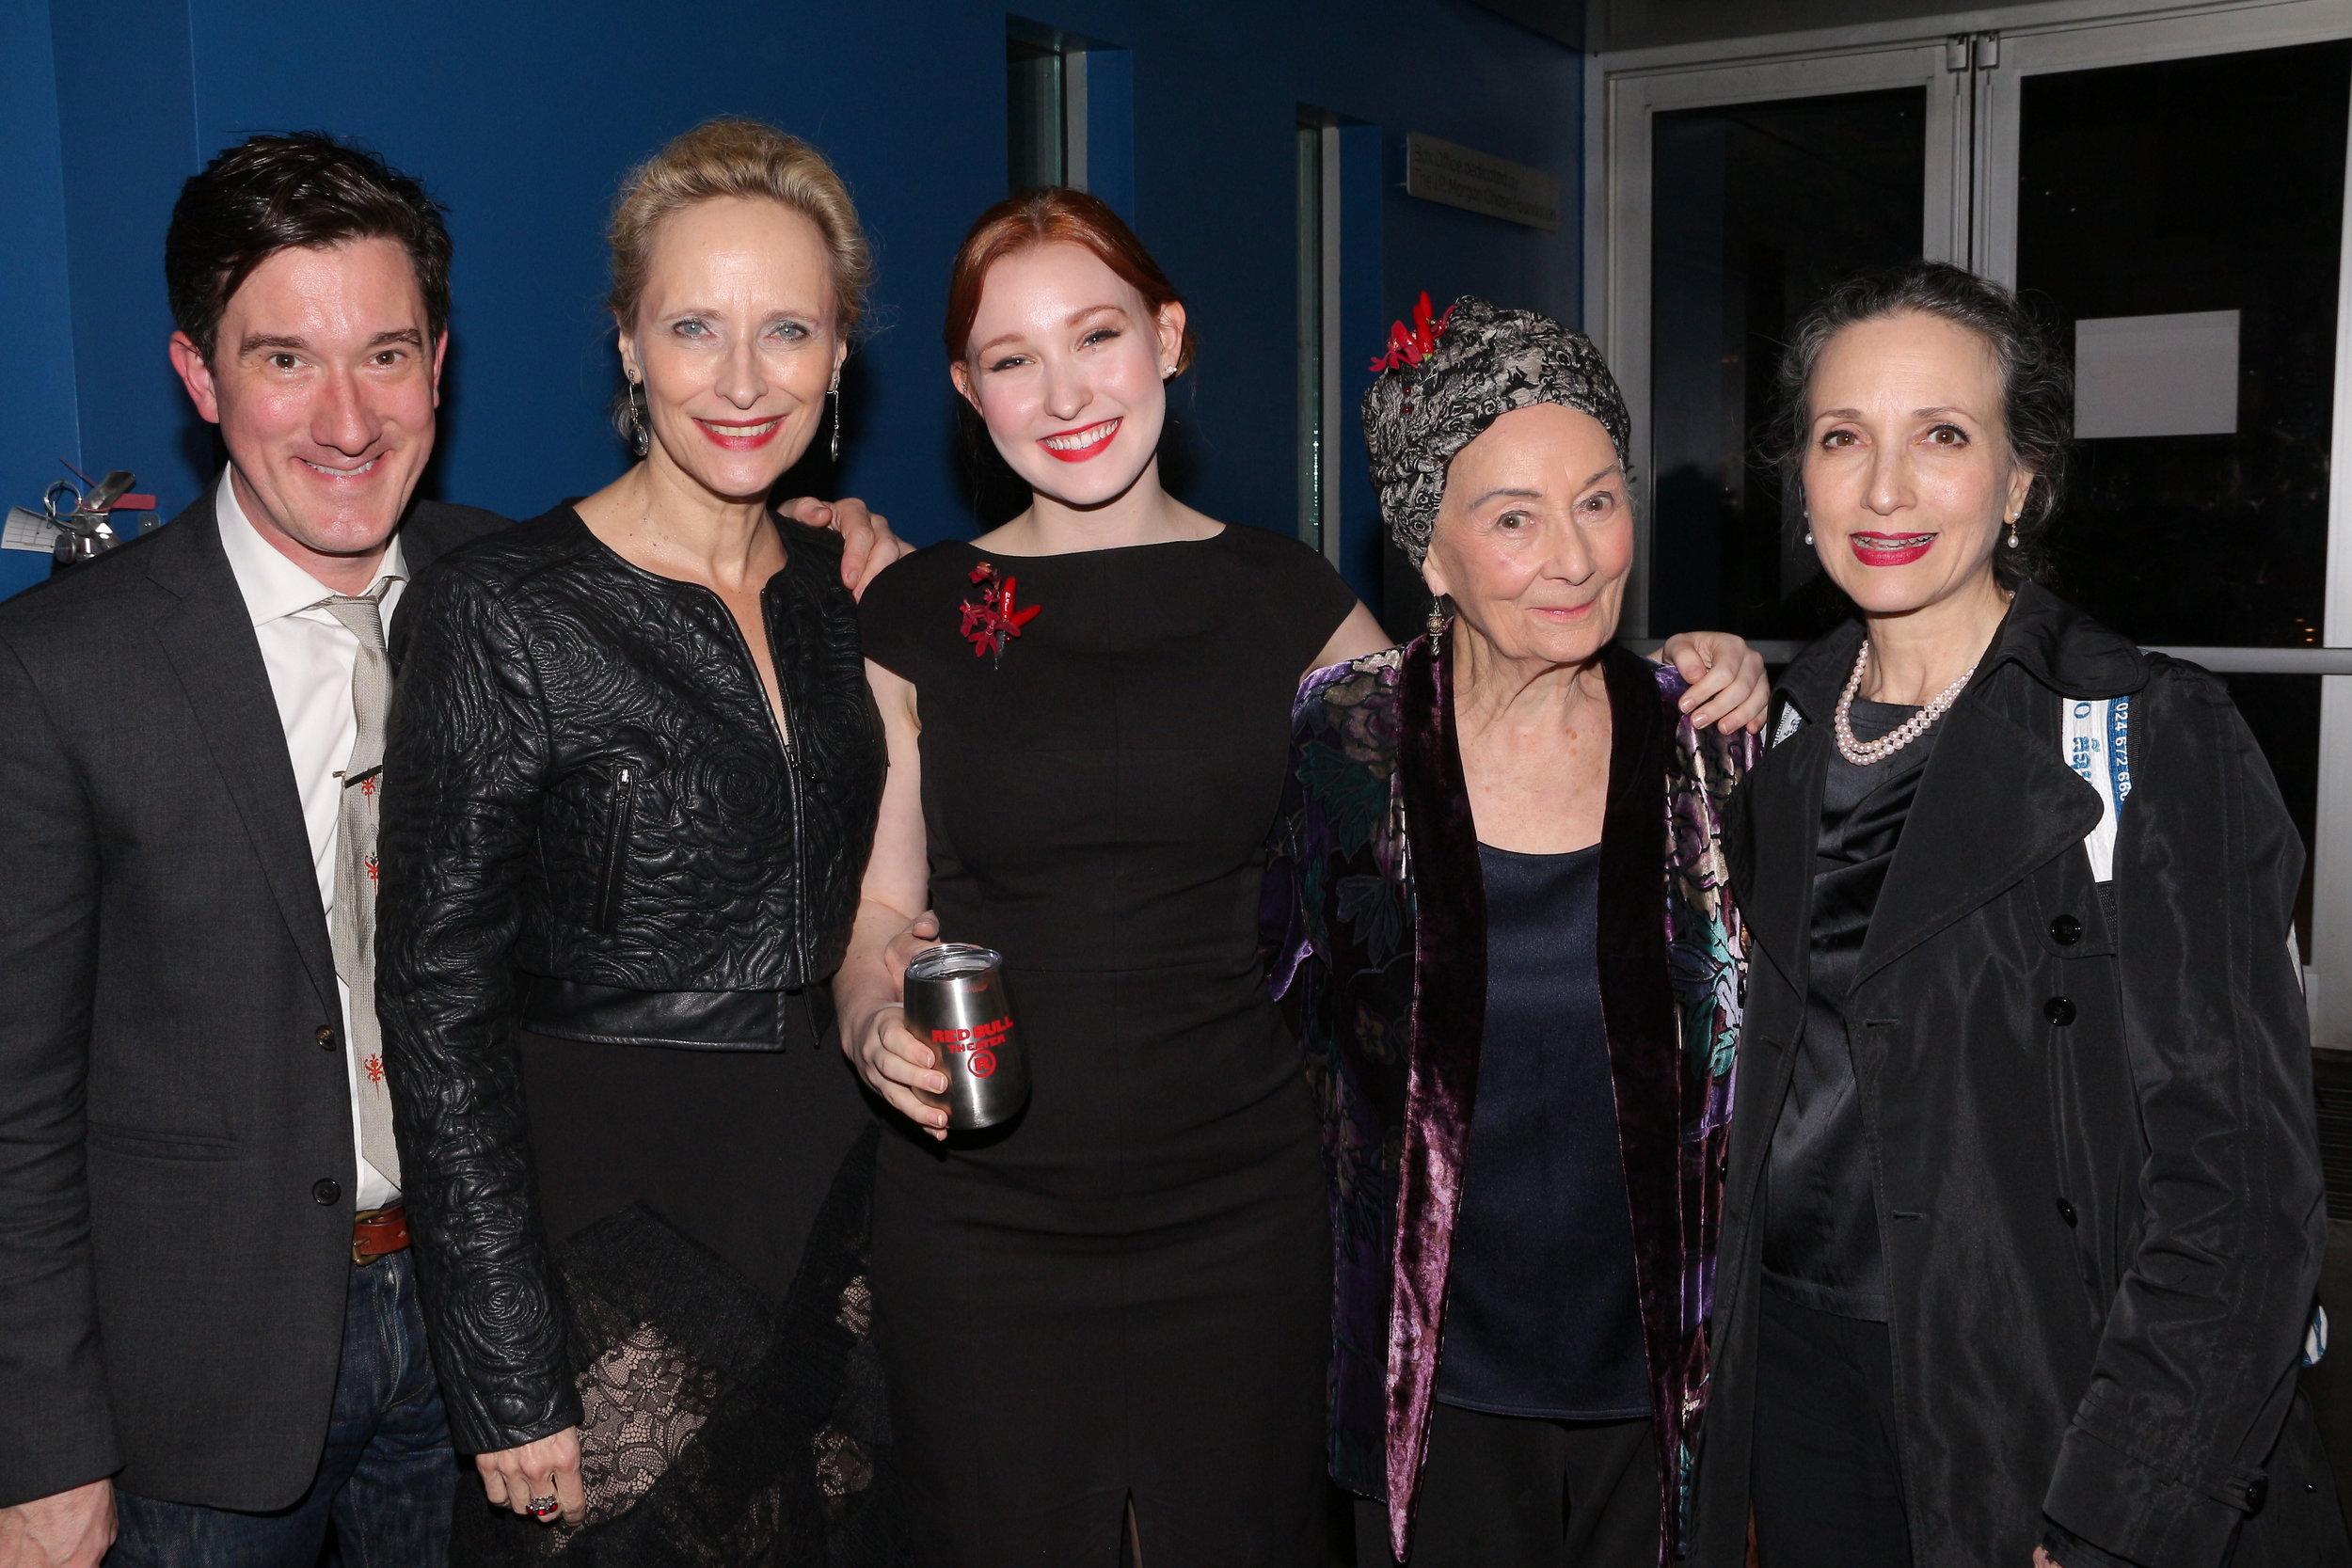 Carson Elrod, Laila Robins, Chessa Metz, Rosemary Harris, Bebe Neuwrith (2).JPG